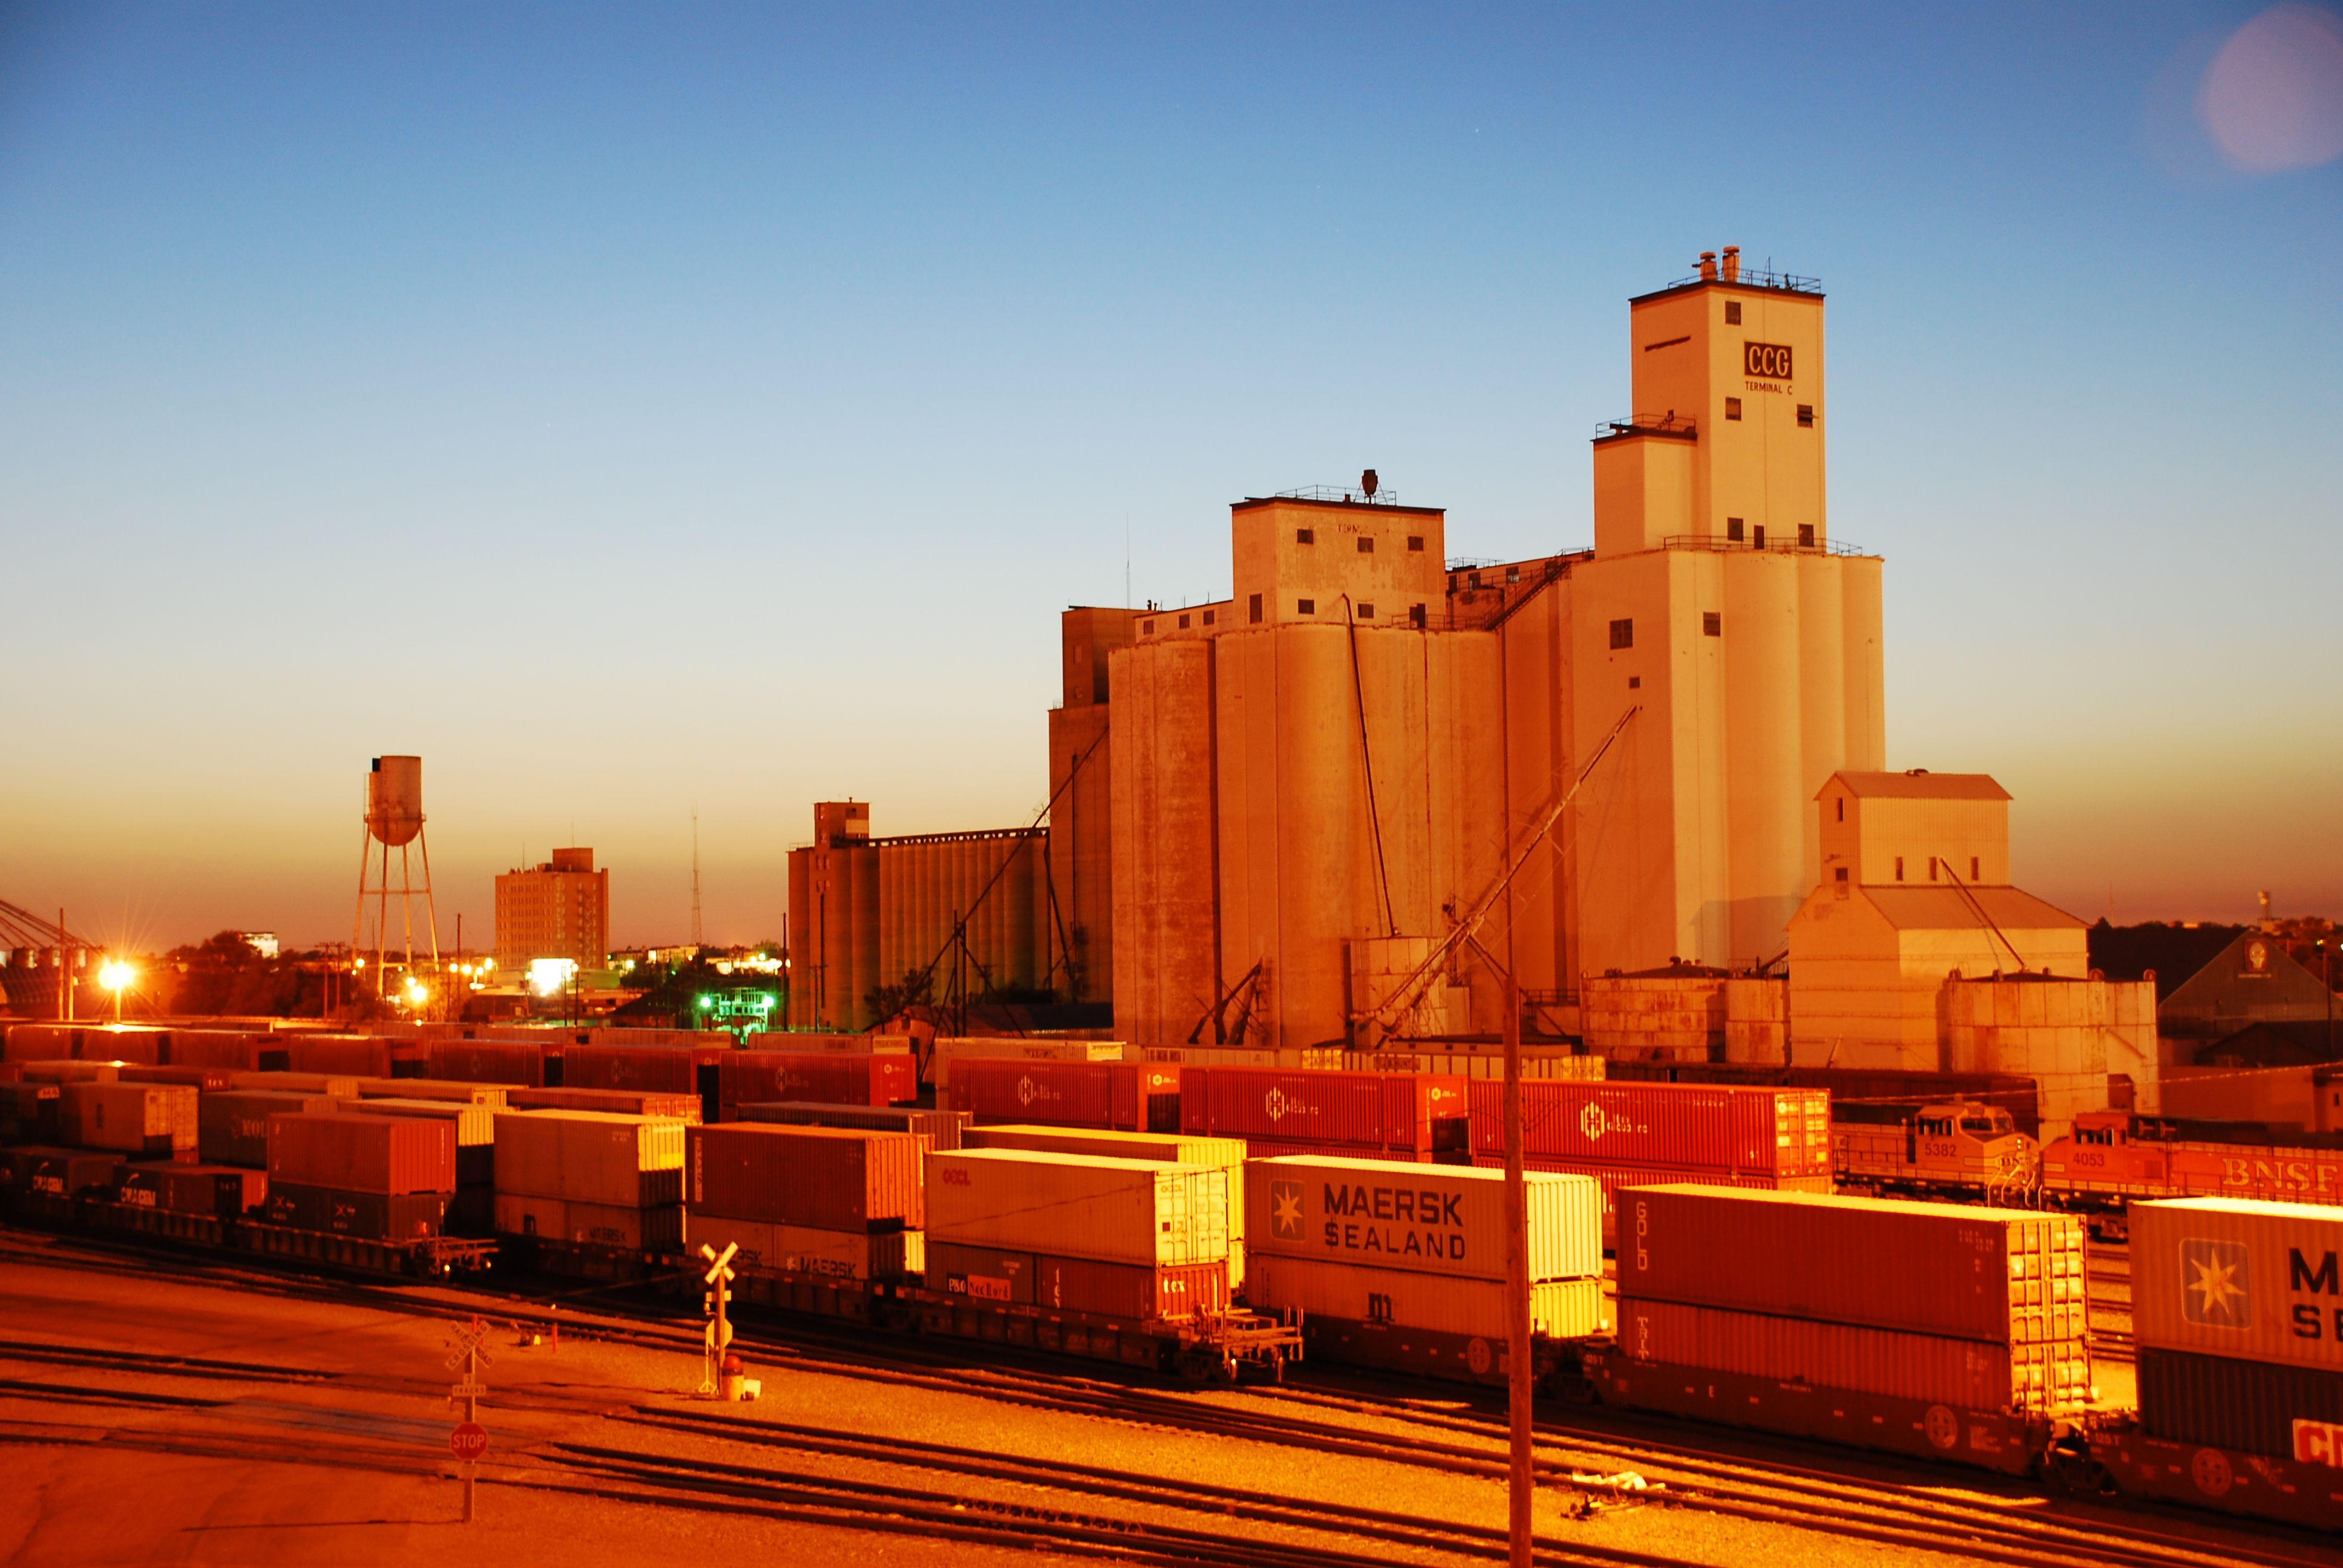 Clovis, NM Trains Track Depots Clovis new mexico